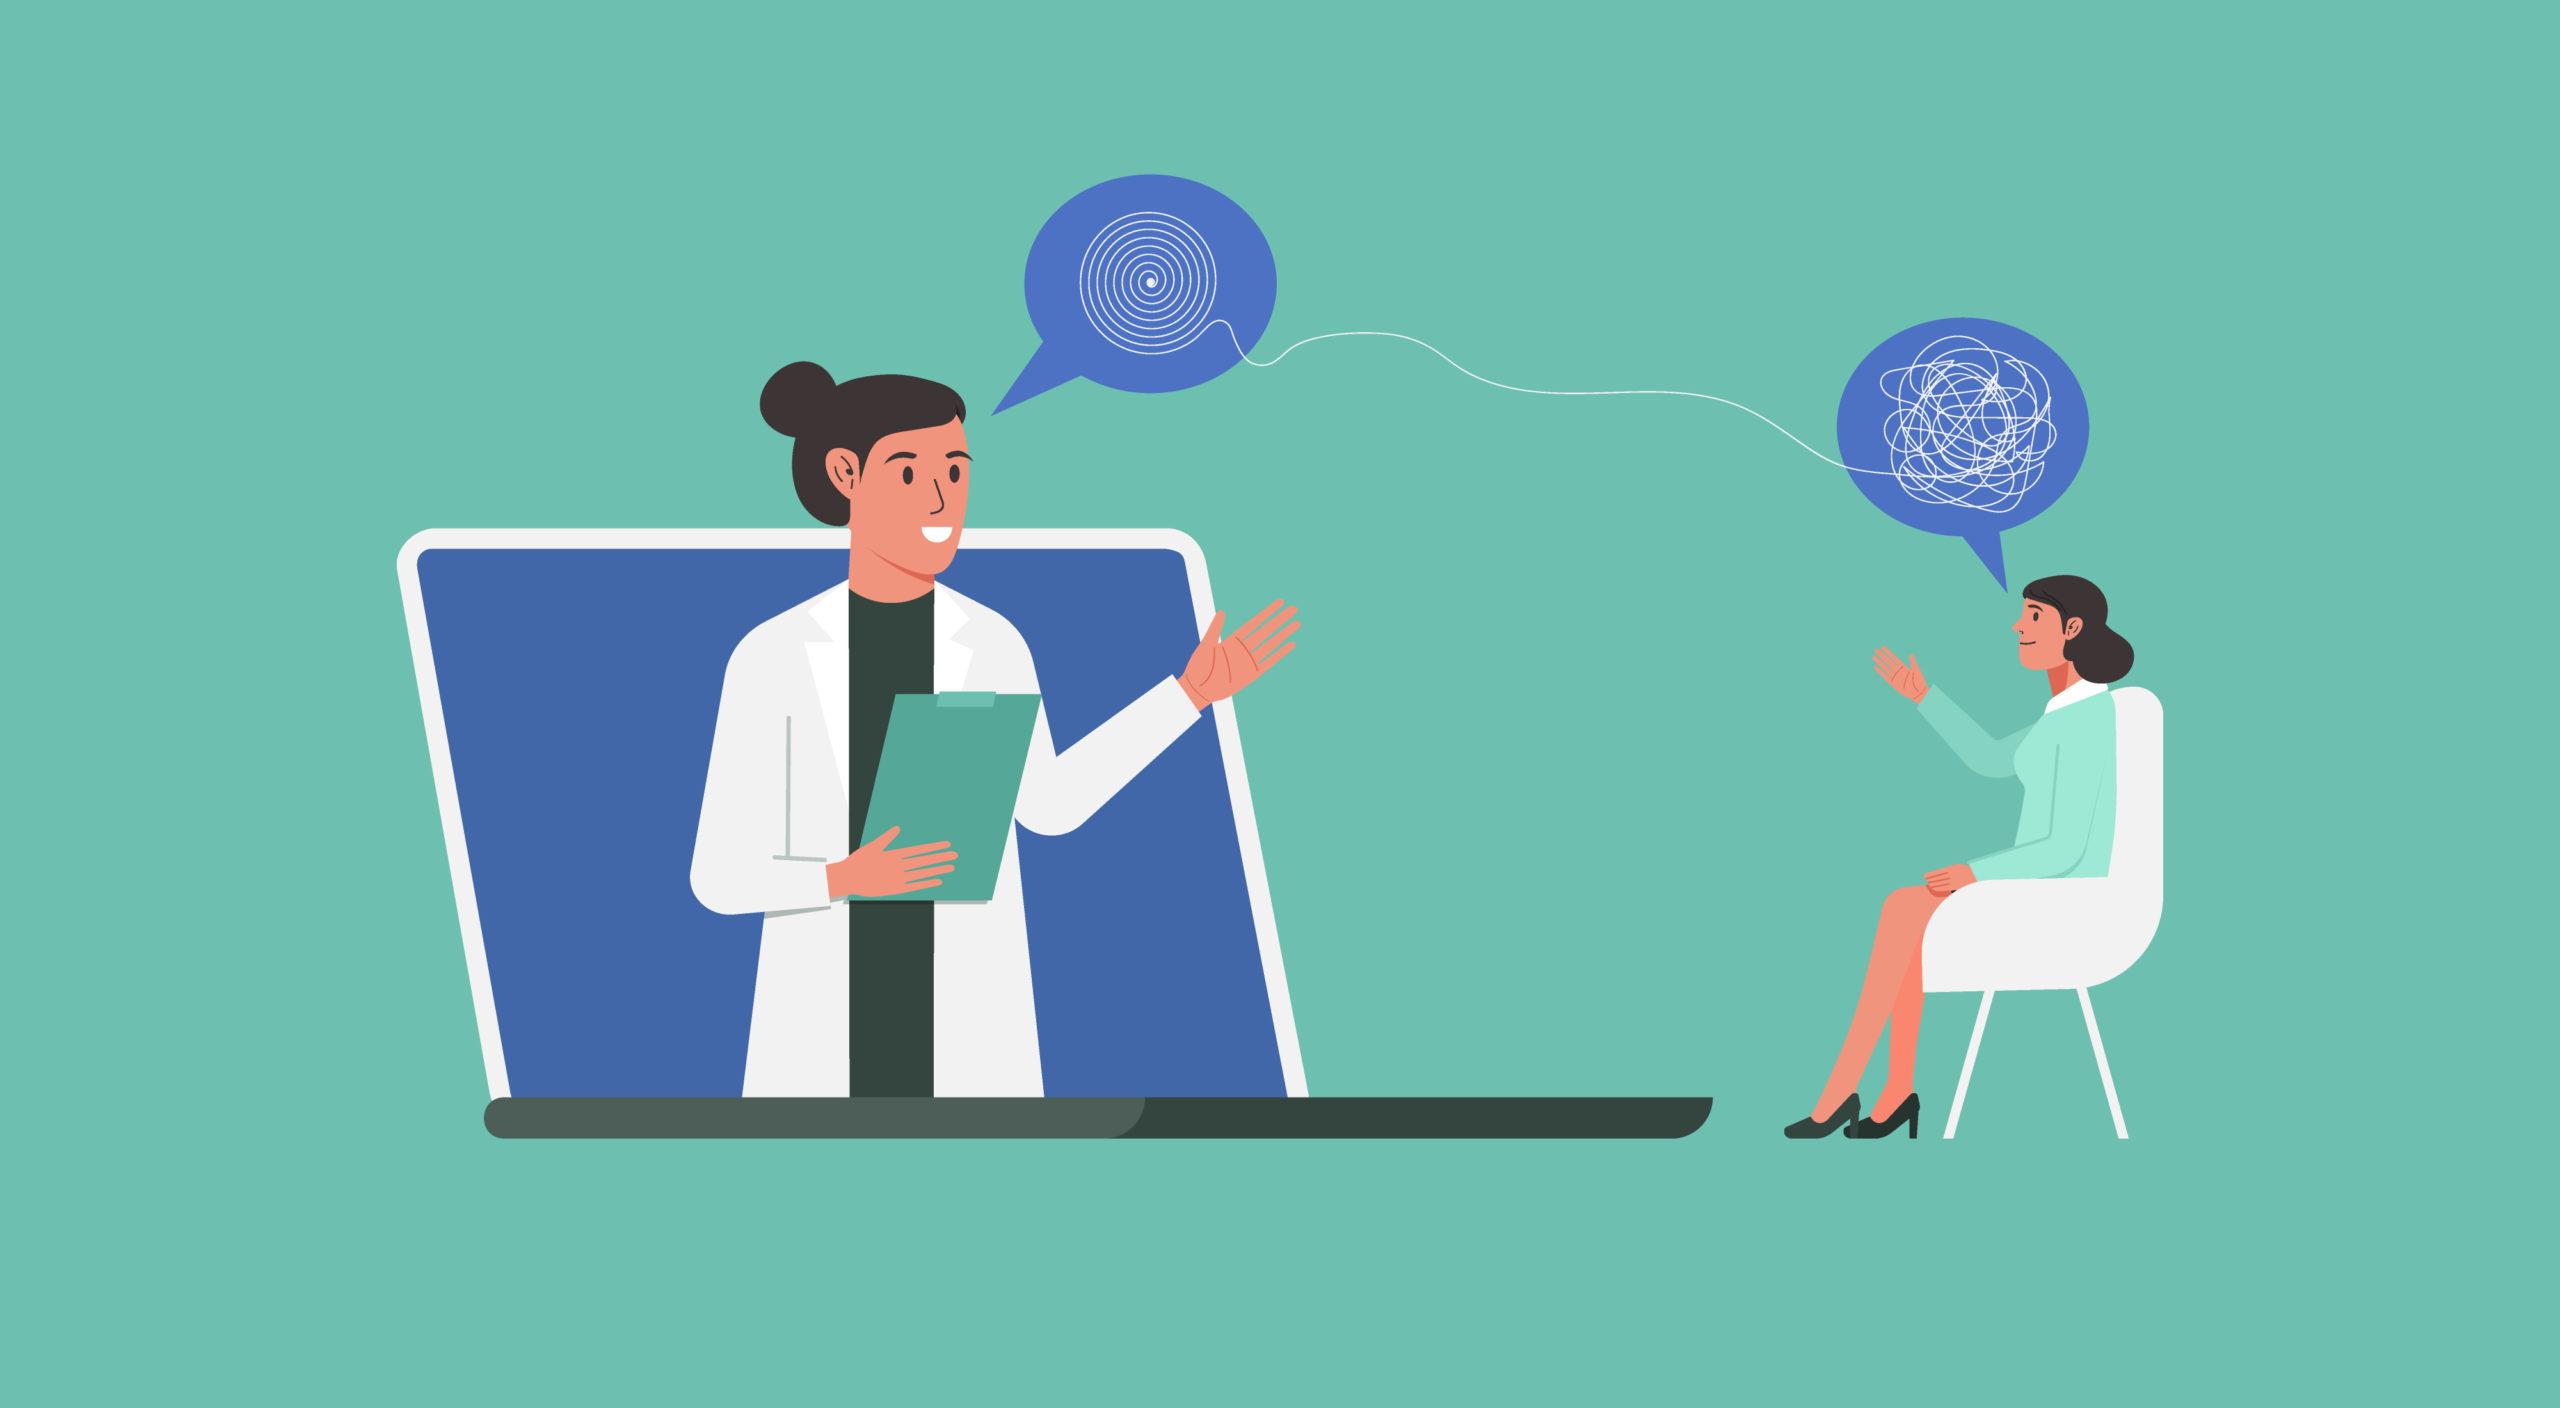 Doctor helps patient through telehealth